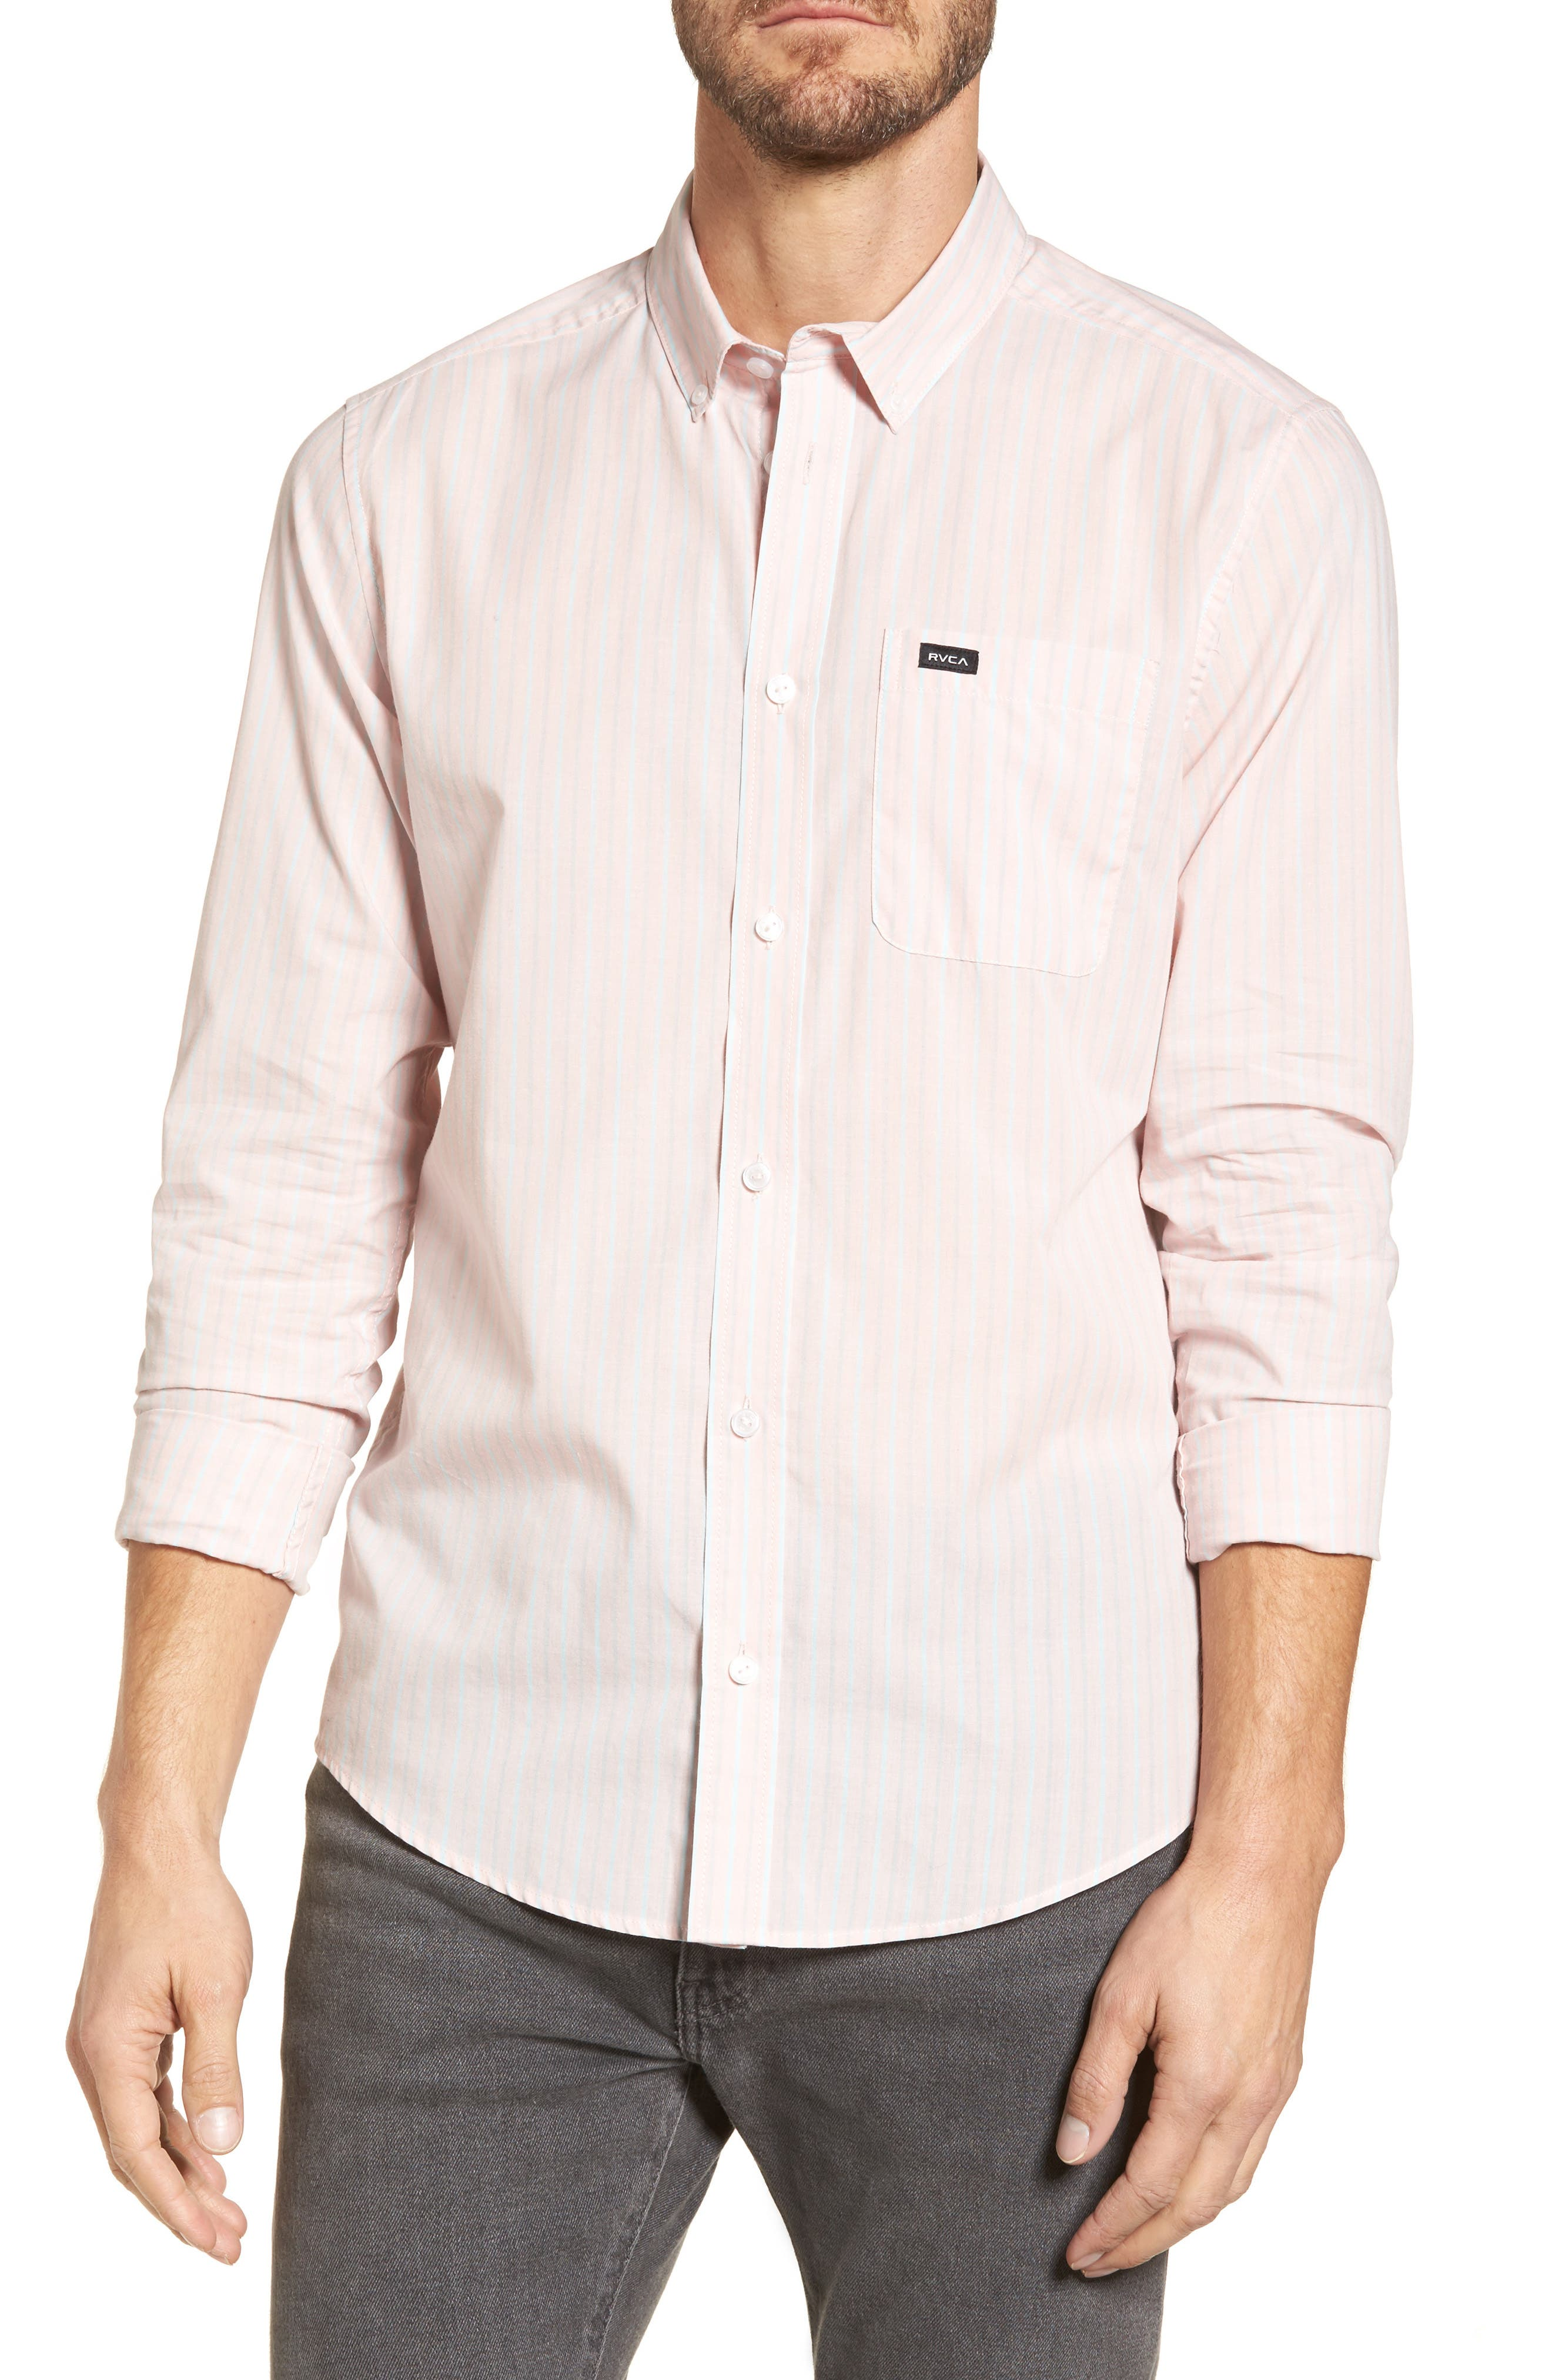 Alternate Image 1 Selected - RVCA Everyday Stripe Shirt